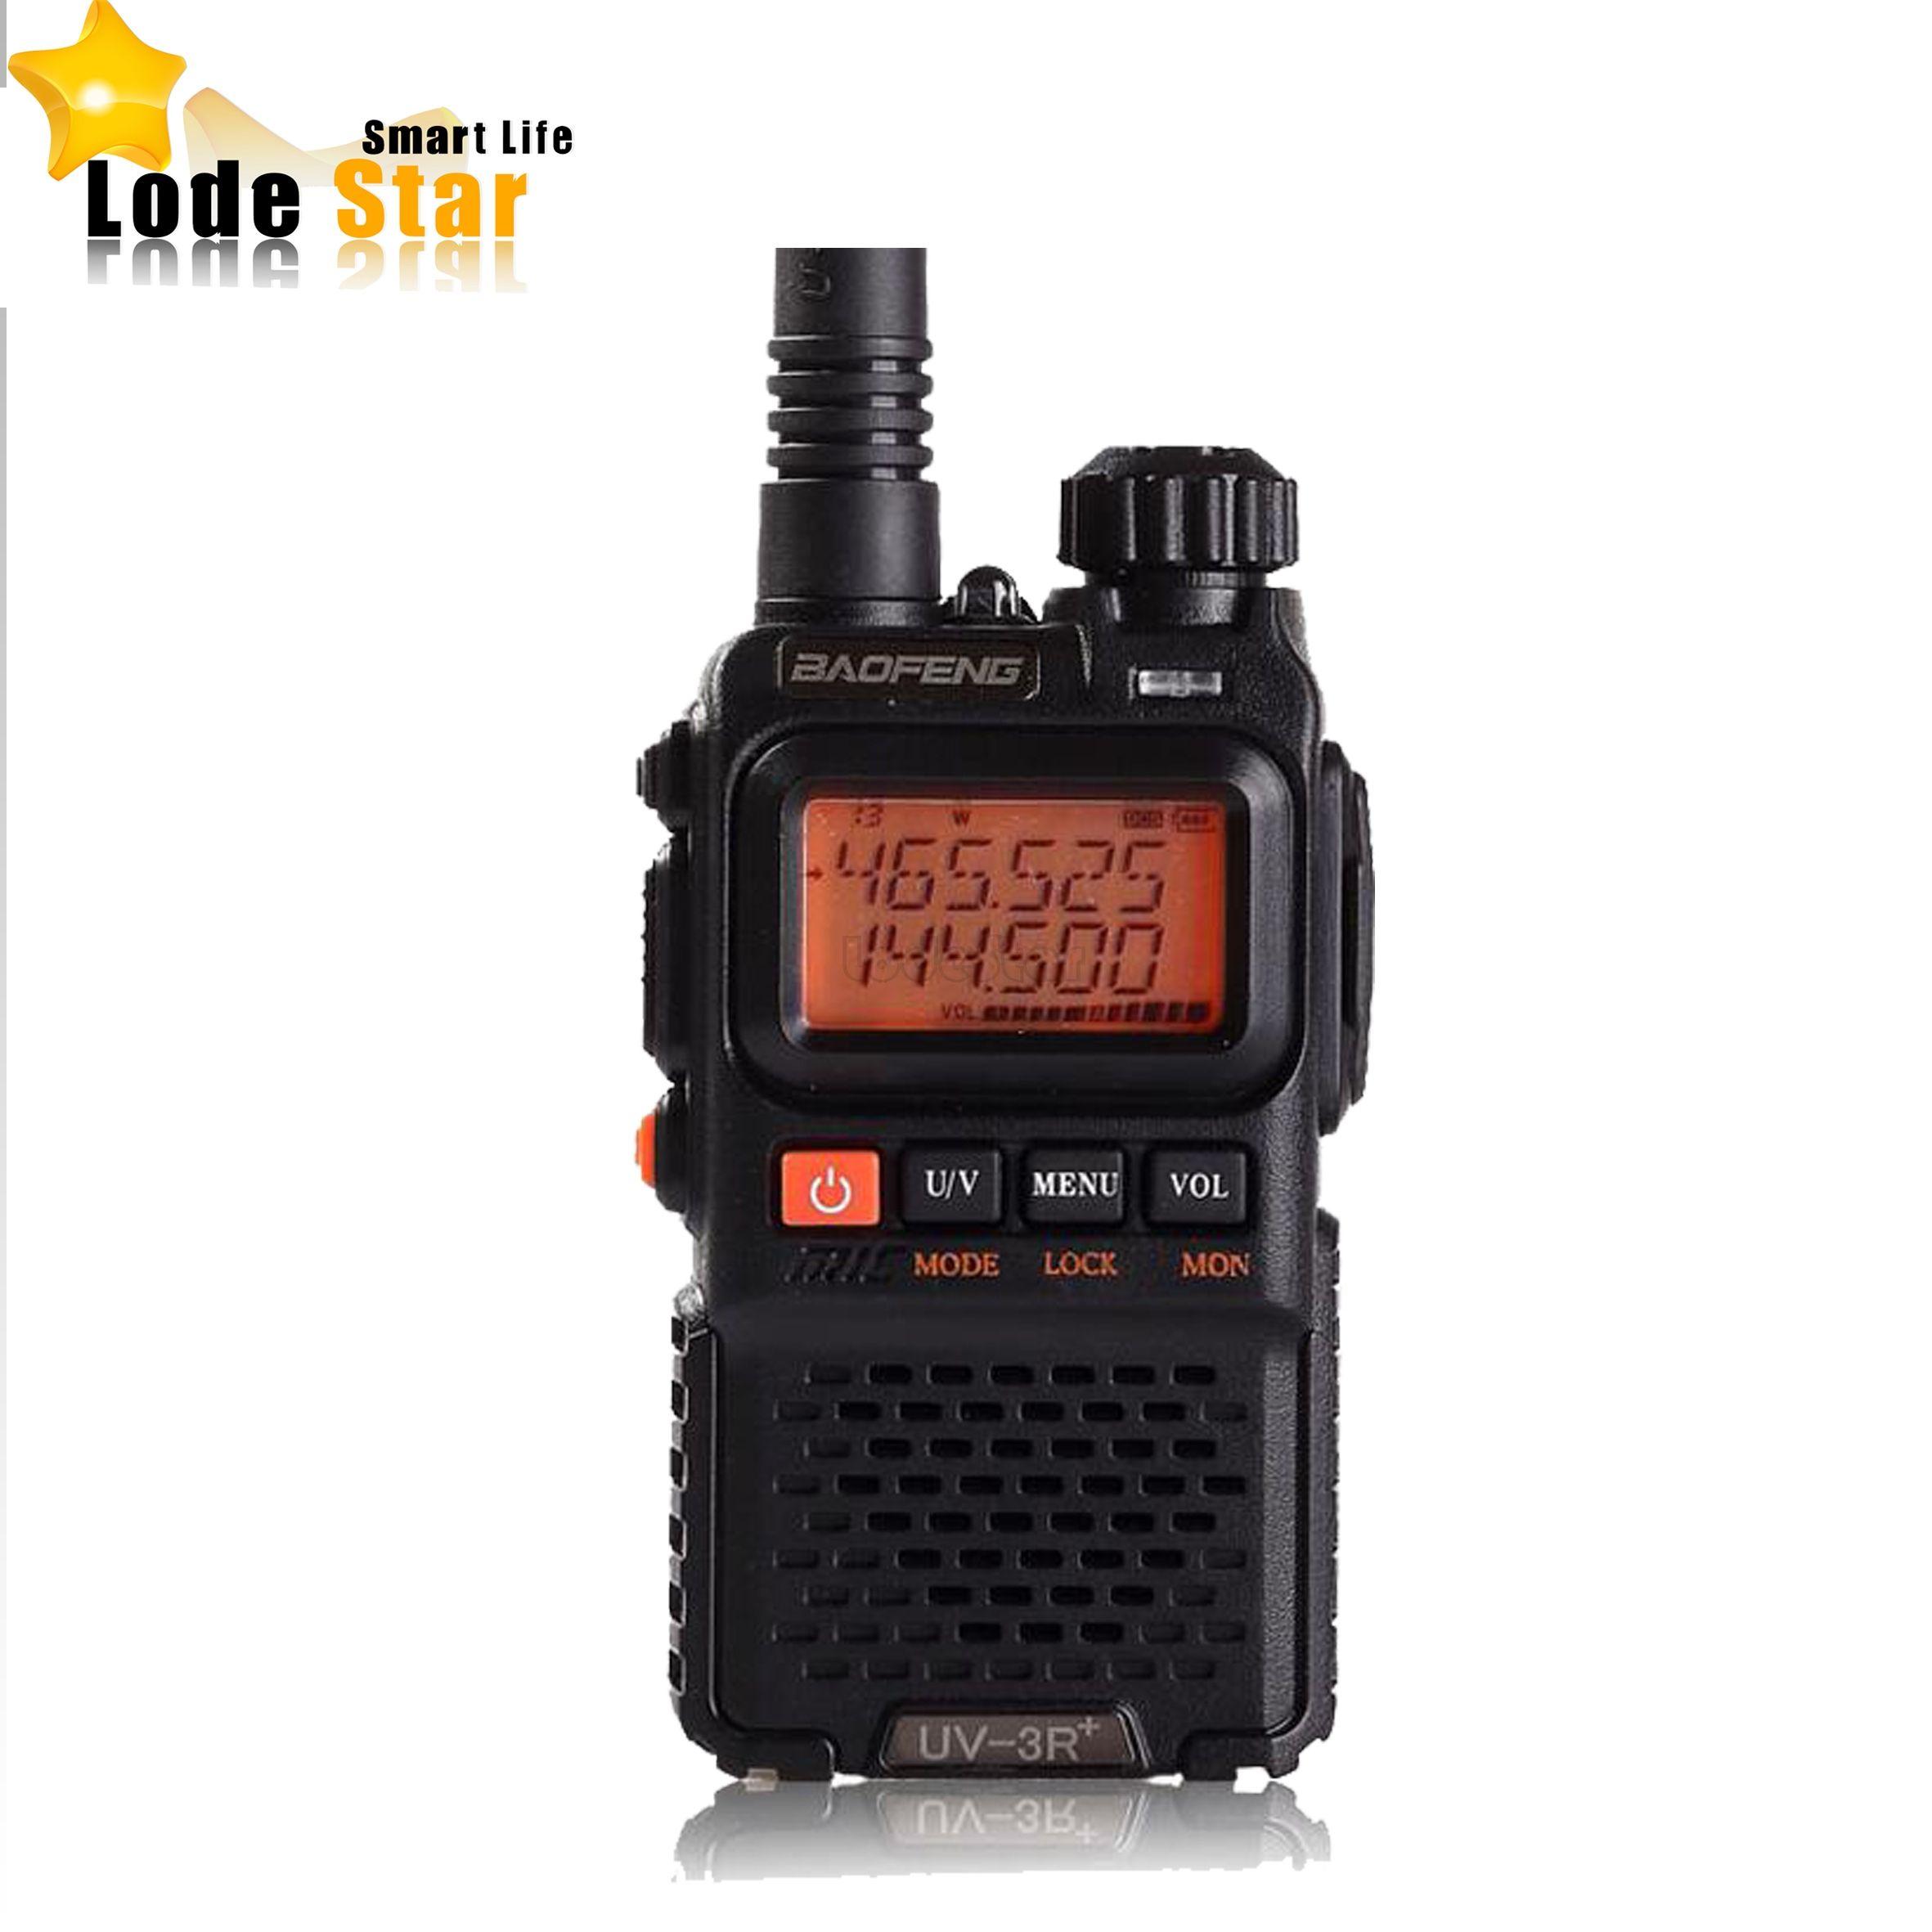 20 Pack Baofeng BF-888S 1500 mAh Two-Way Ham Radio Walkie Talkie Transceiver US